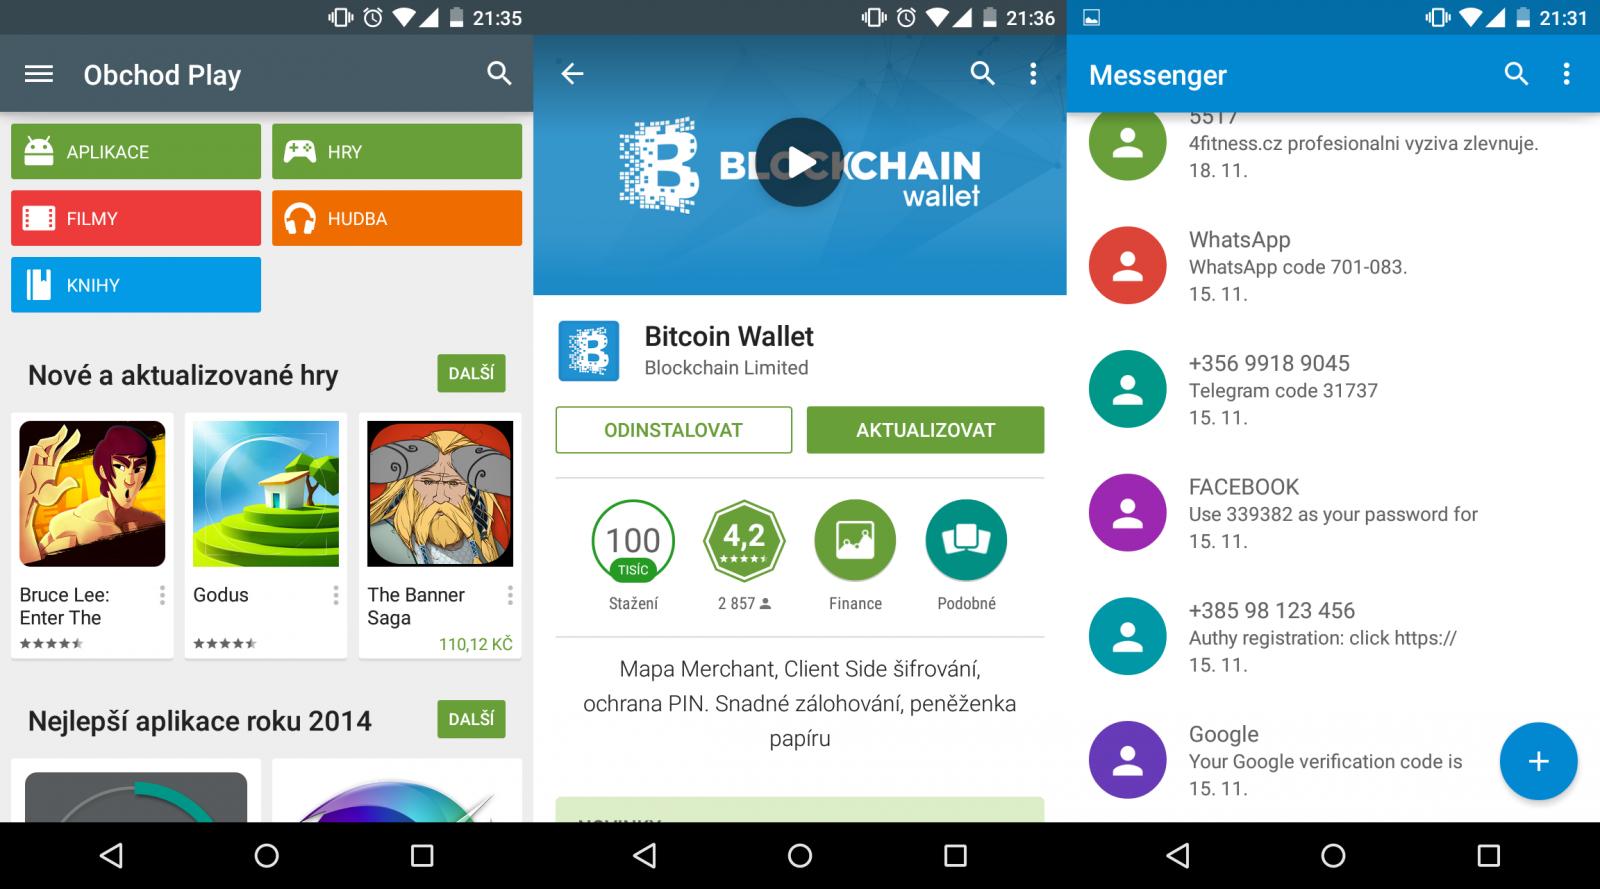 Android 5.0 Lollipop (aplikace)